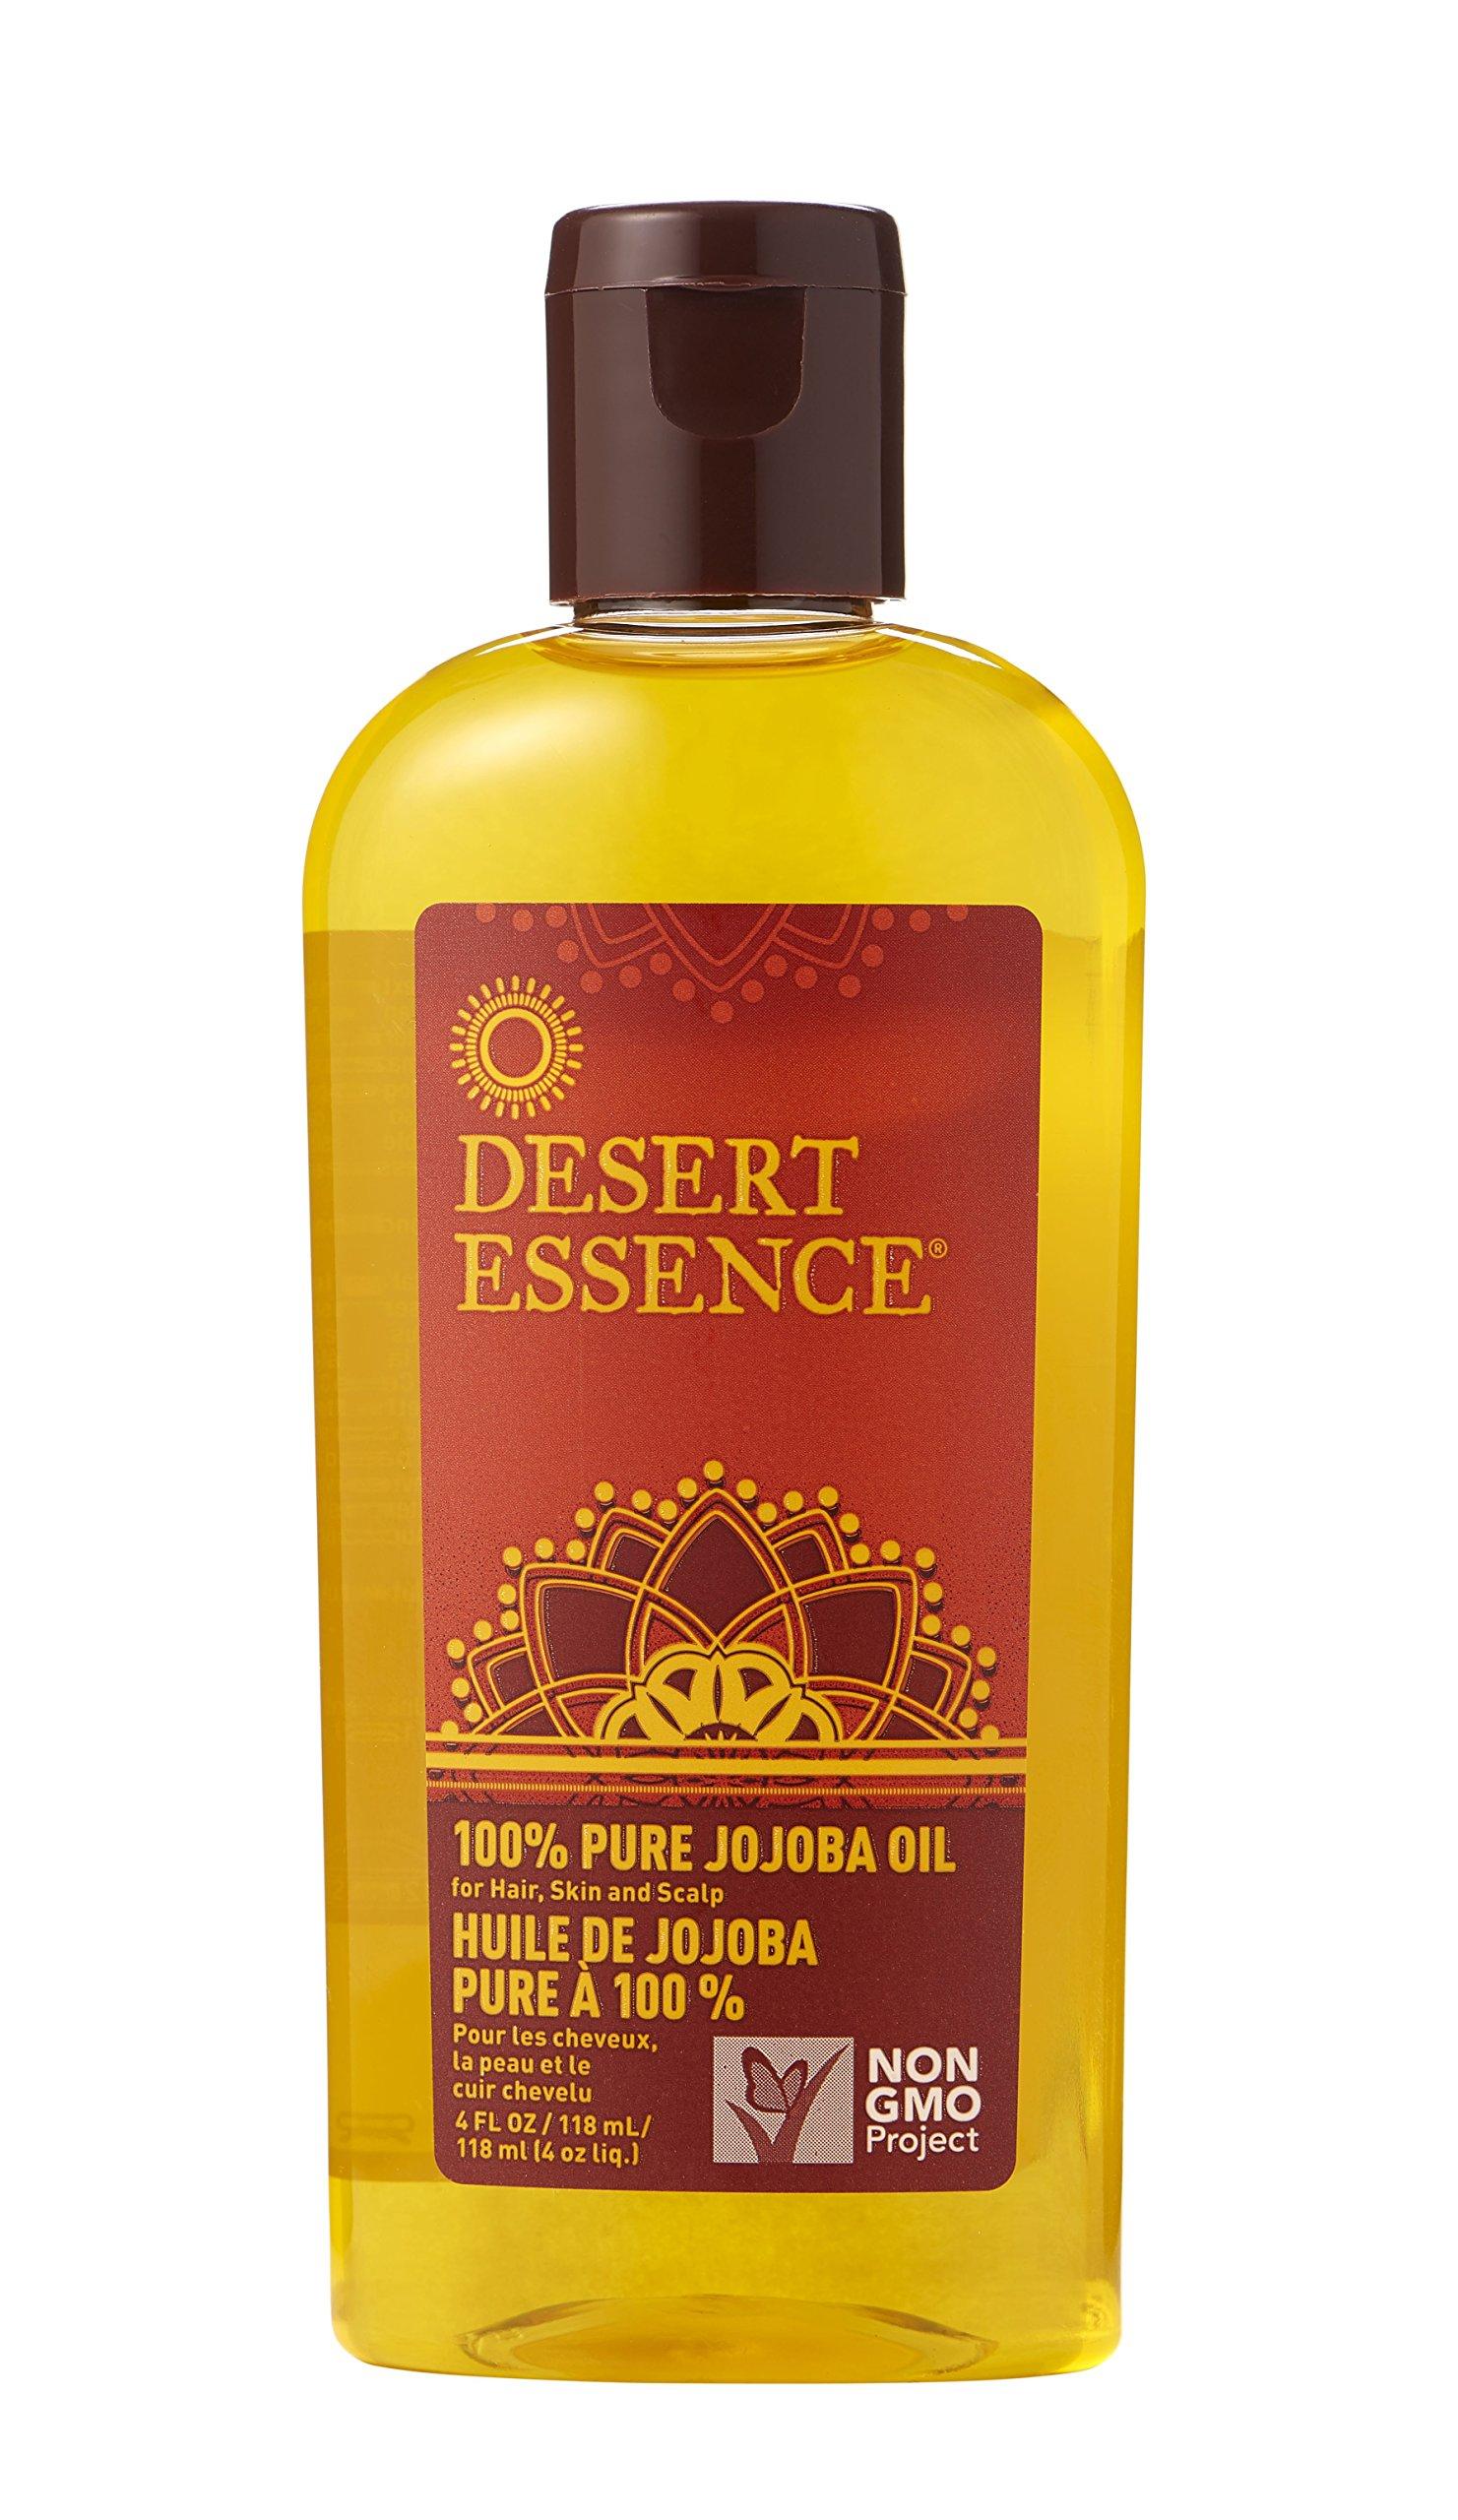 Amazon.com : Desert Essence 100% Pure Jojoba Oil (2pk) 4fl oz : Body Oils :  Beauty